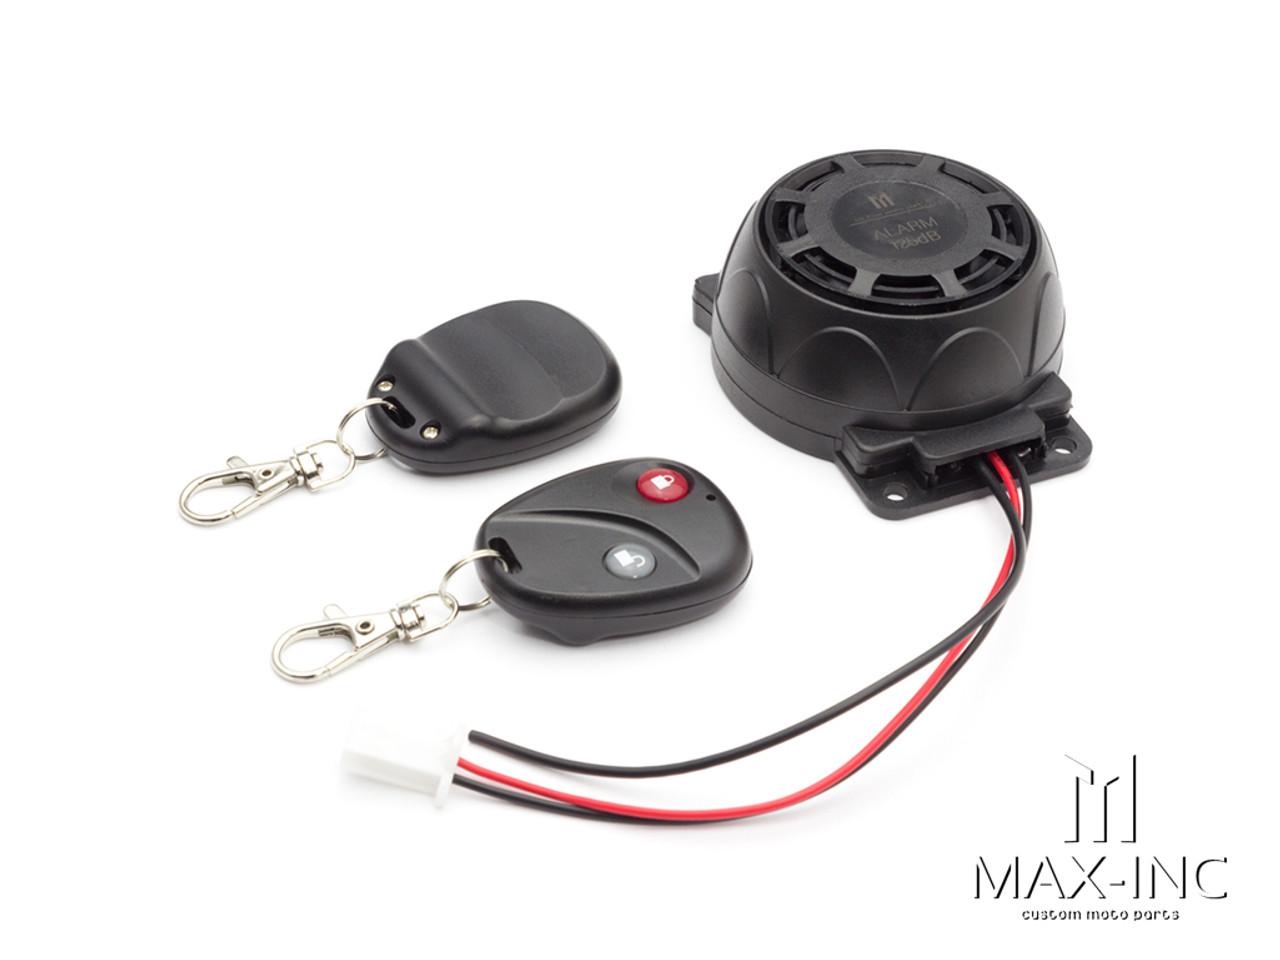 12v Non-Intrusive Universal DIY Alarm System